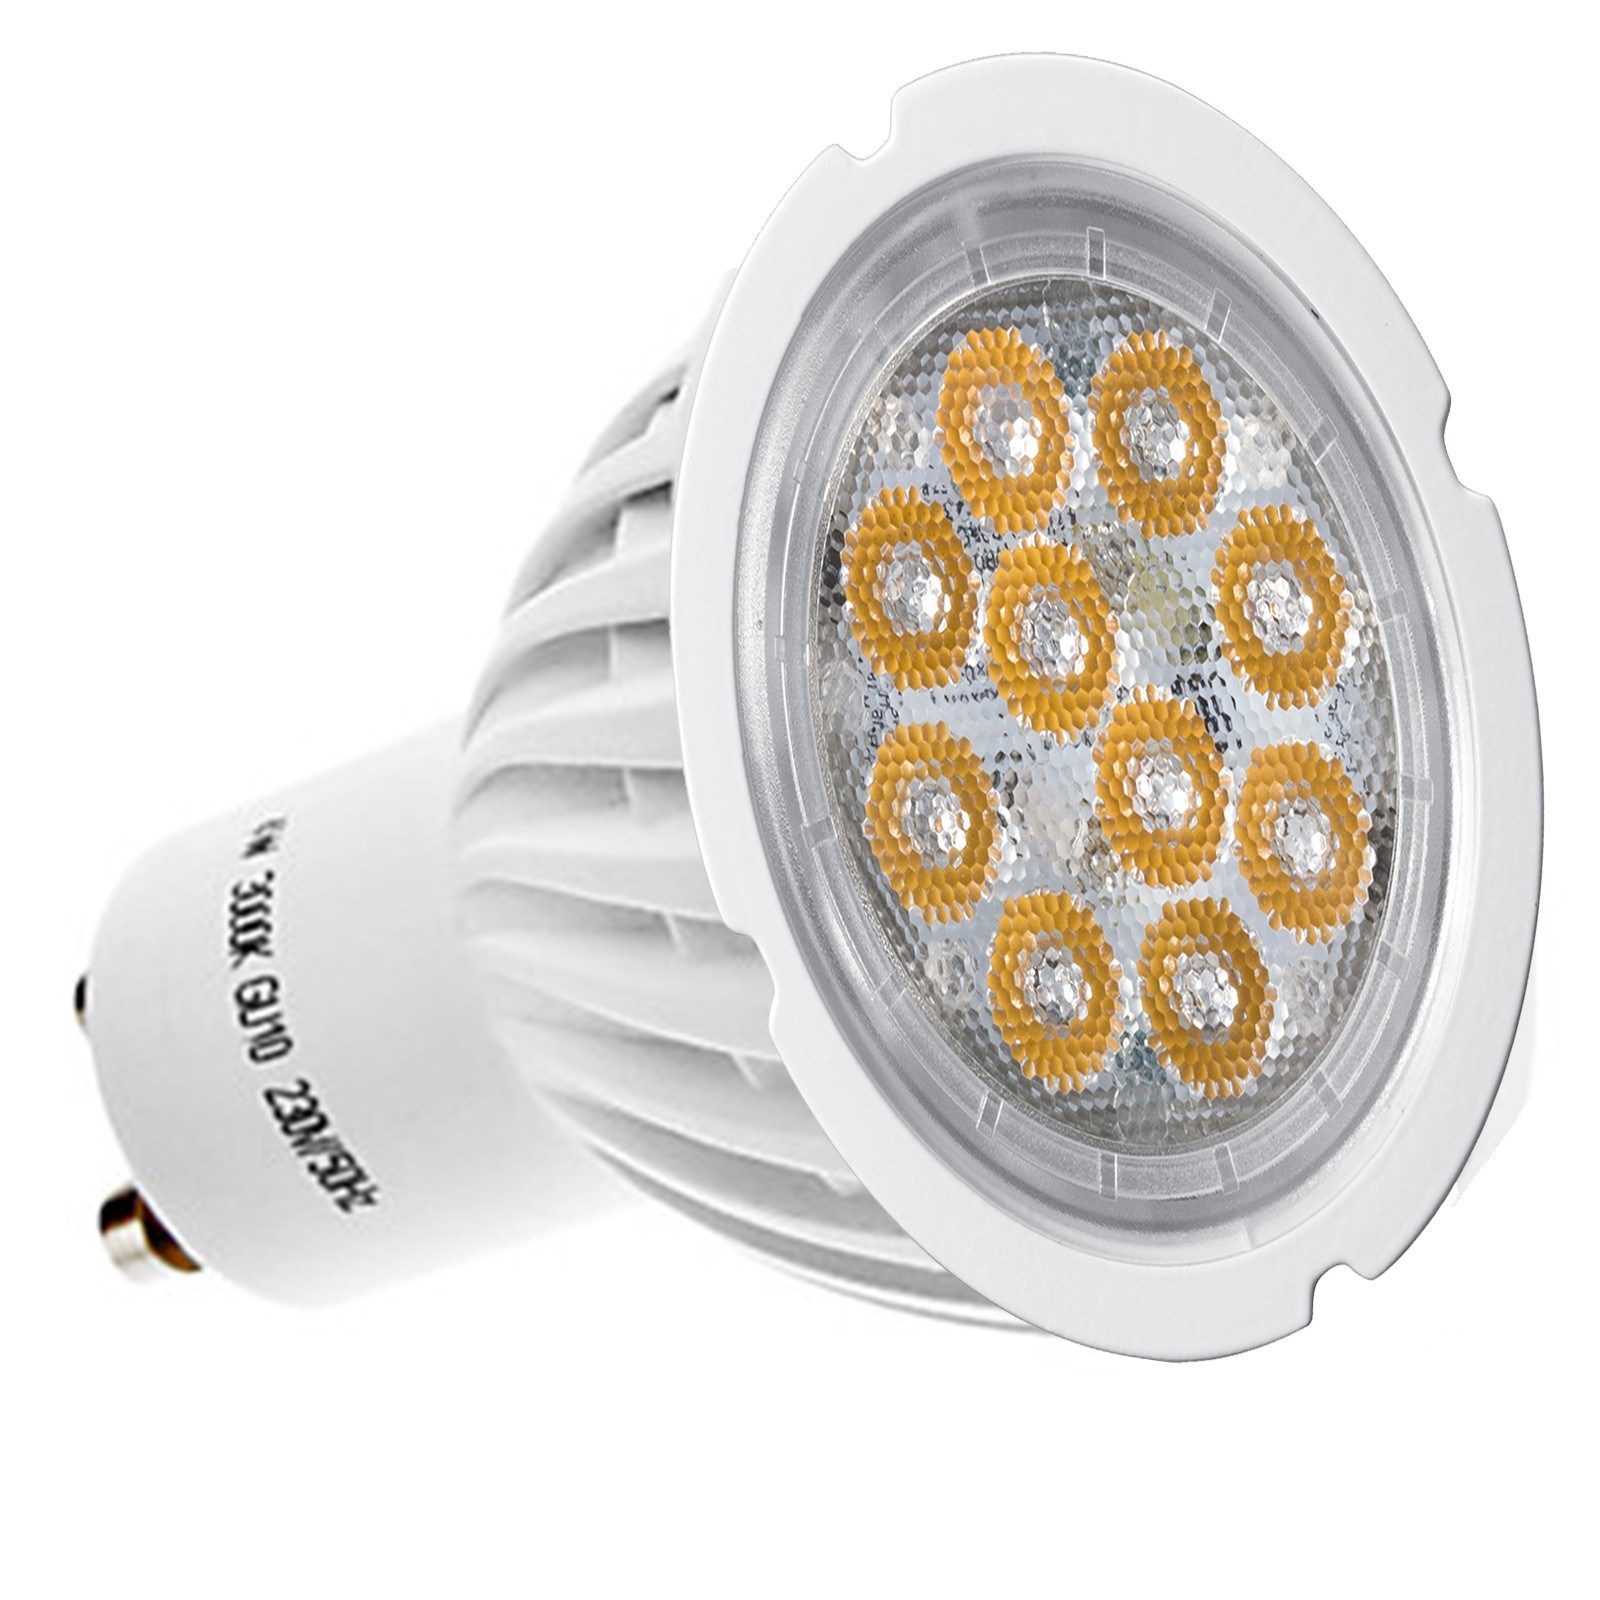 LAMPADINA LAMPADA FARO FARETTO A 10 LED SPOT GU10 6W LUCE FREDDA SMD 300 LUMEN